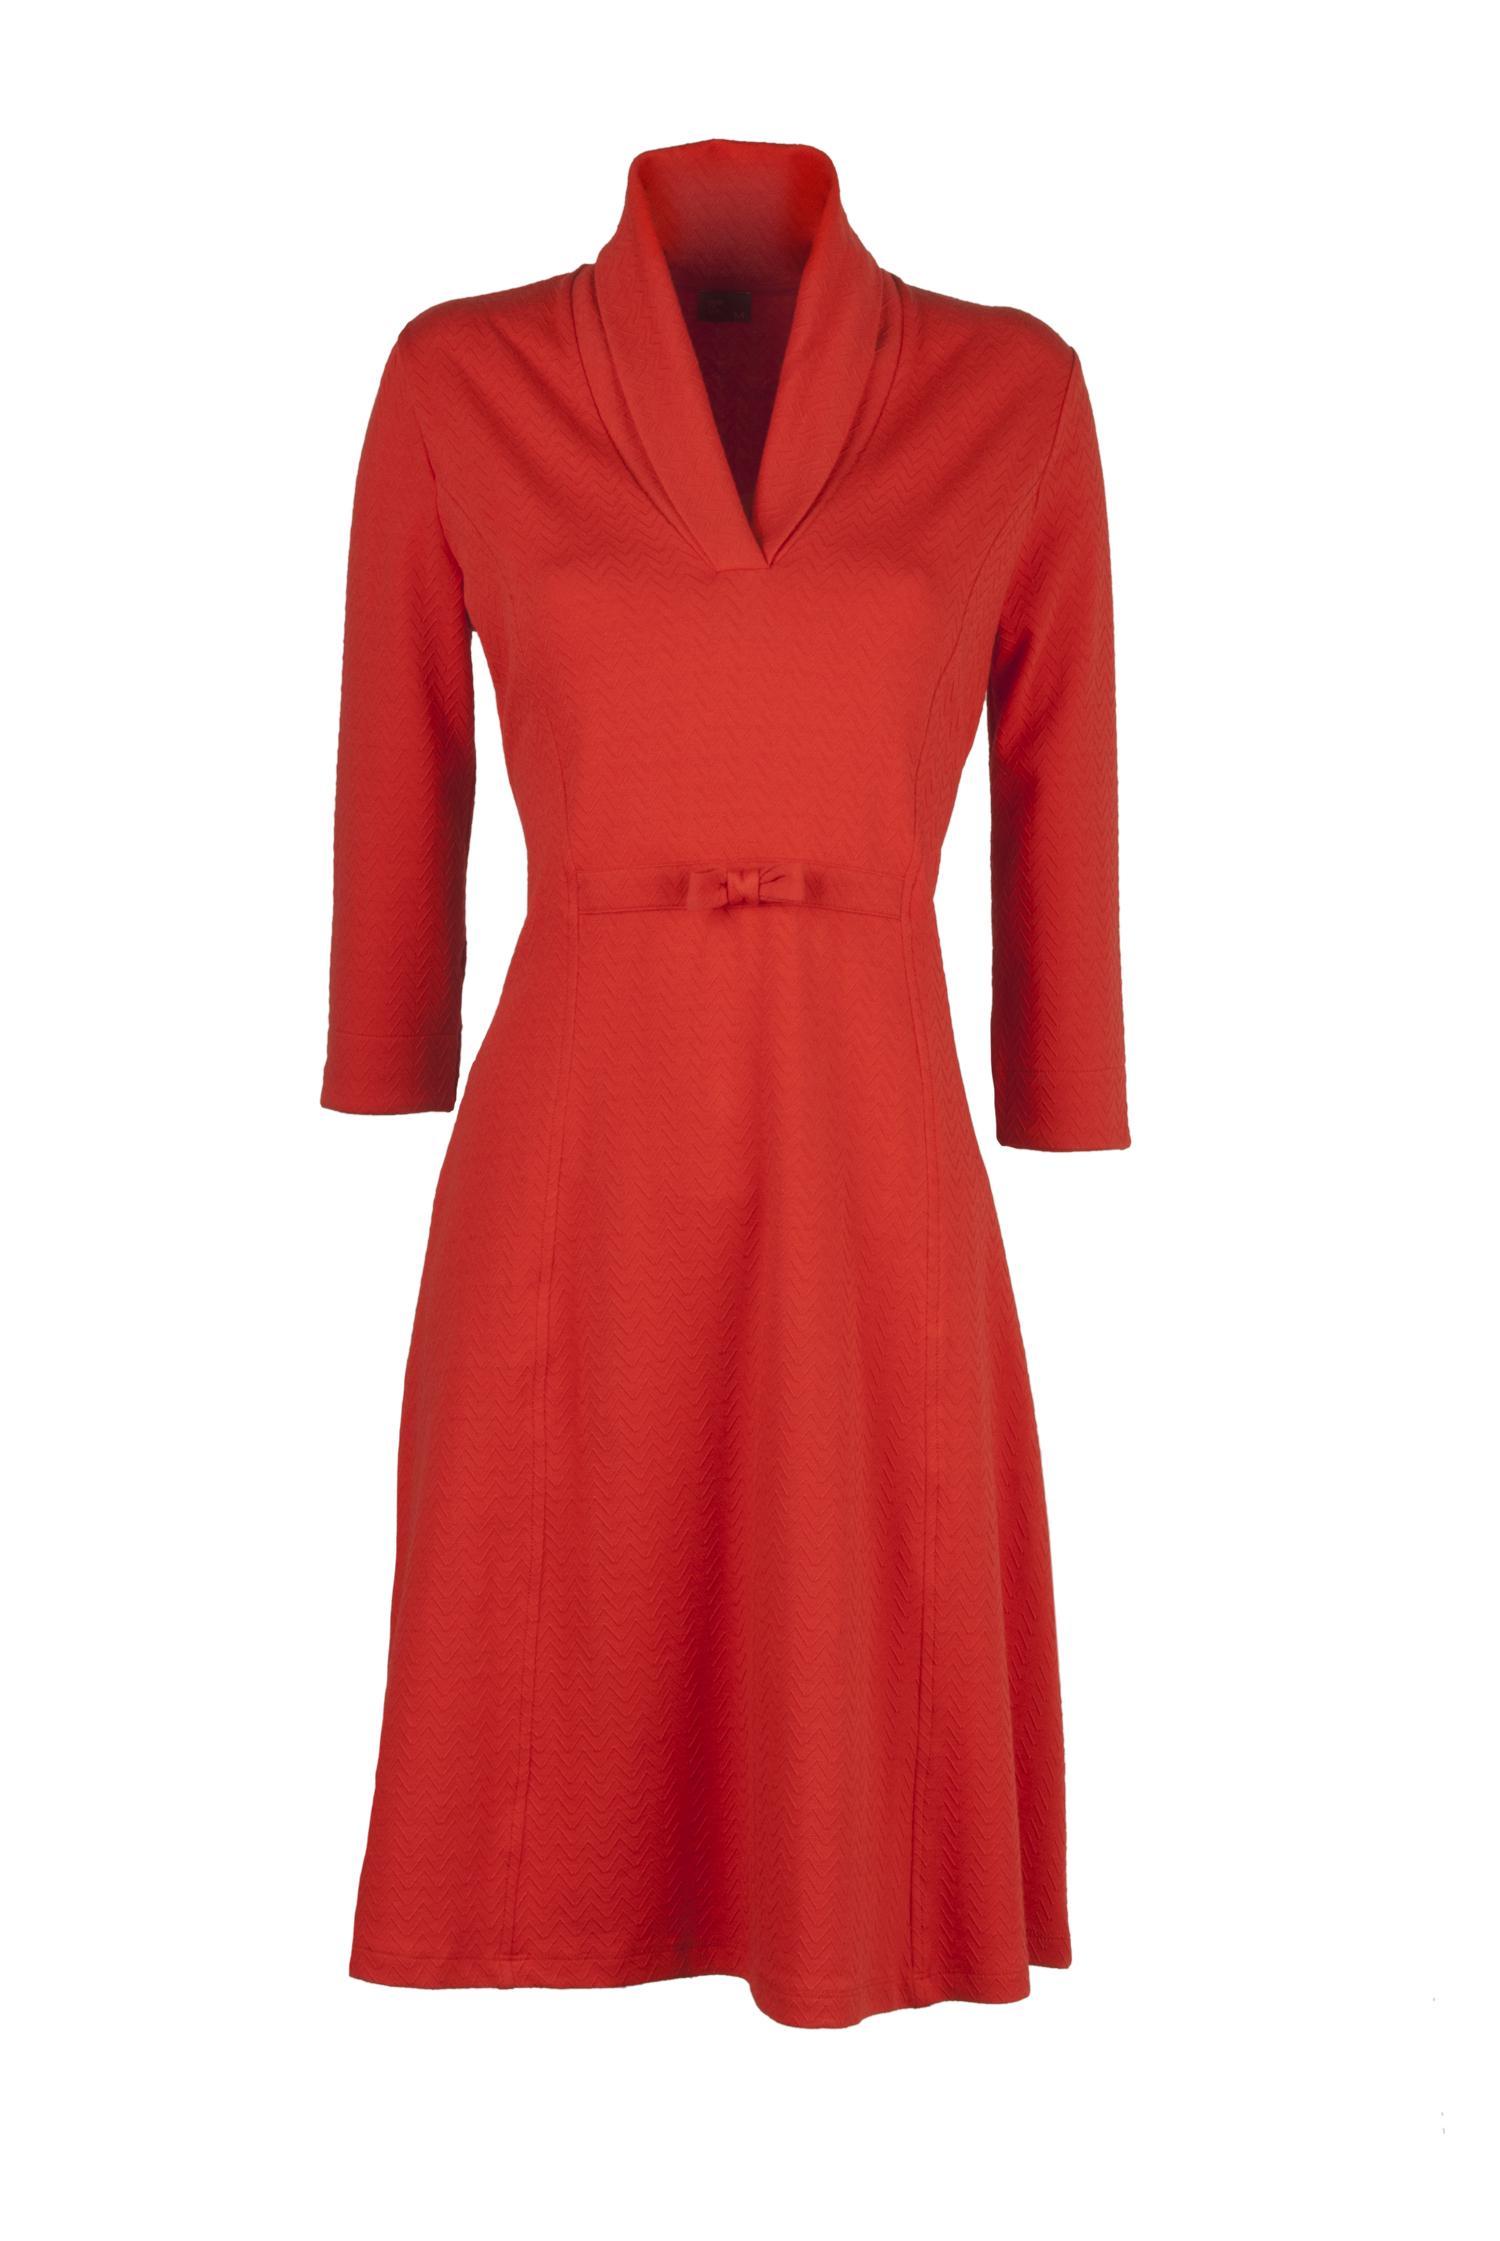 Favoriete Hoe straal je in een rode jurk? - Libelle &LM02